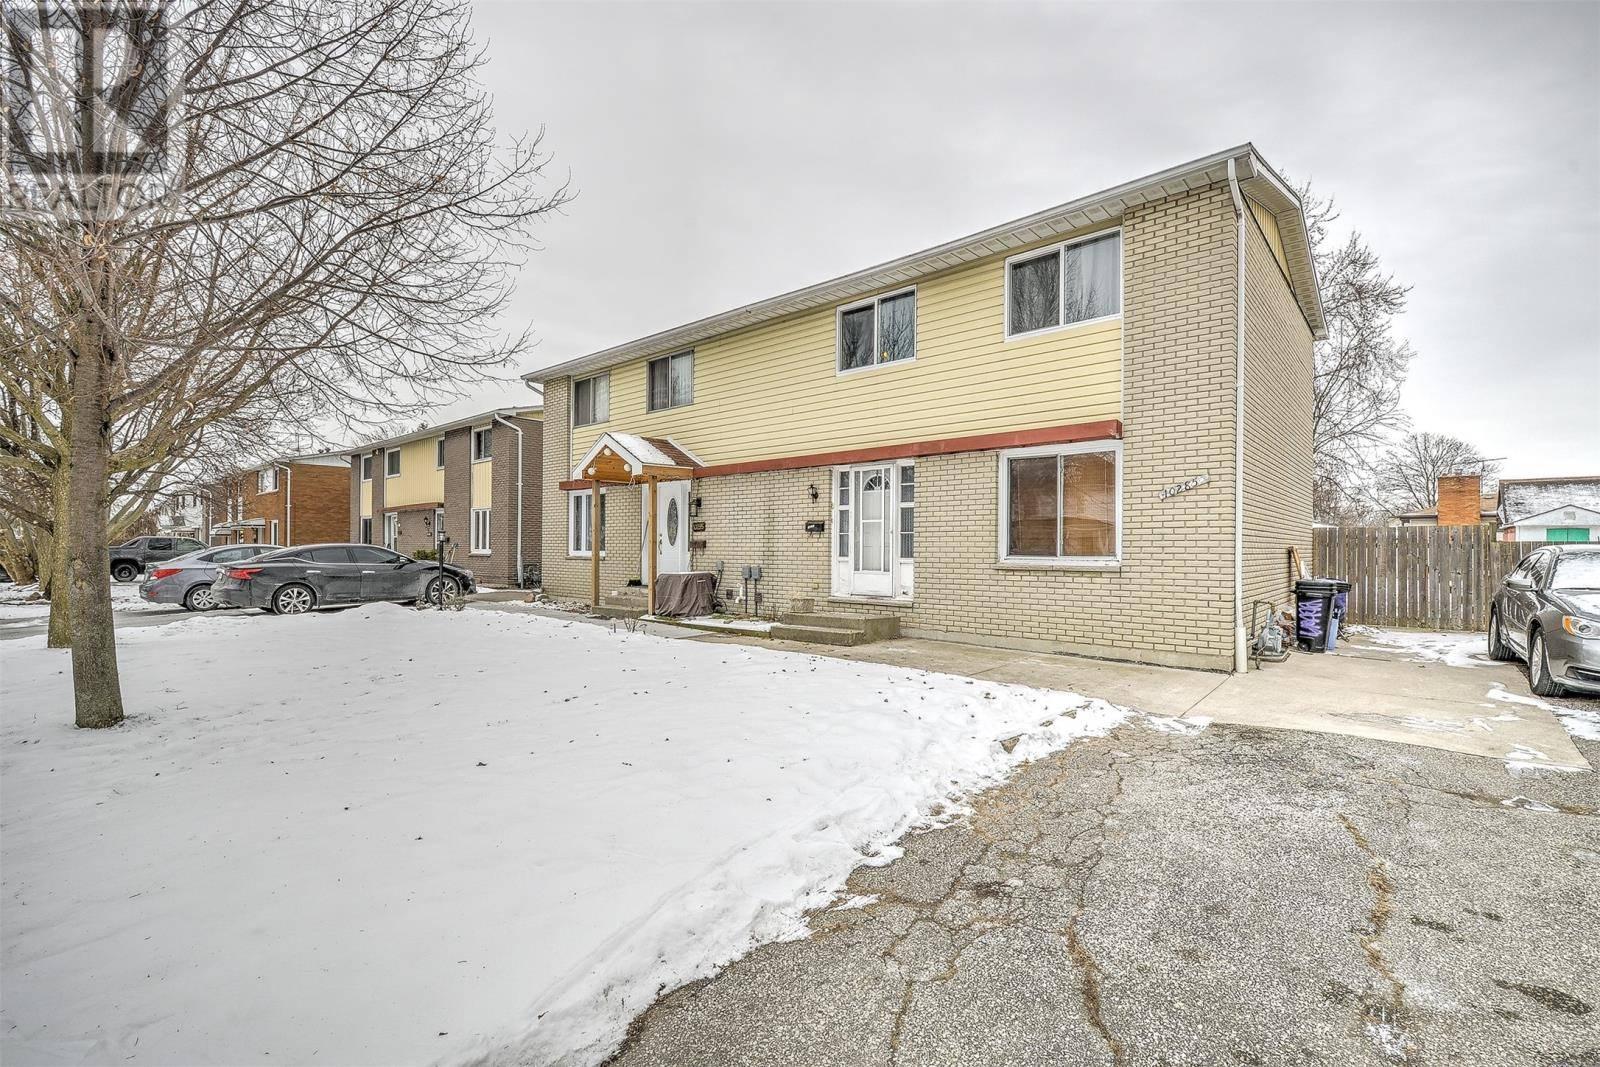 House for sale at 10285 Shenandoah Cres Windsor Ontario - MLS: 20002462